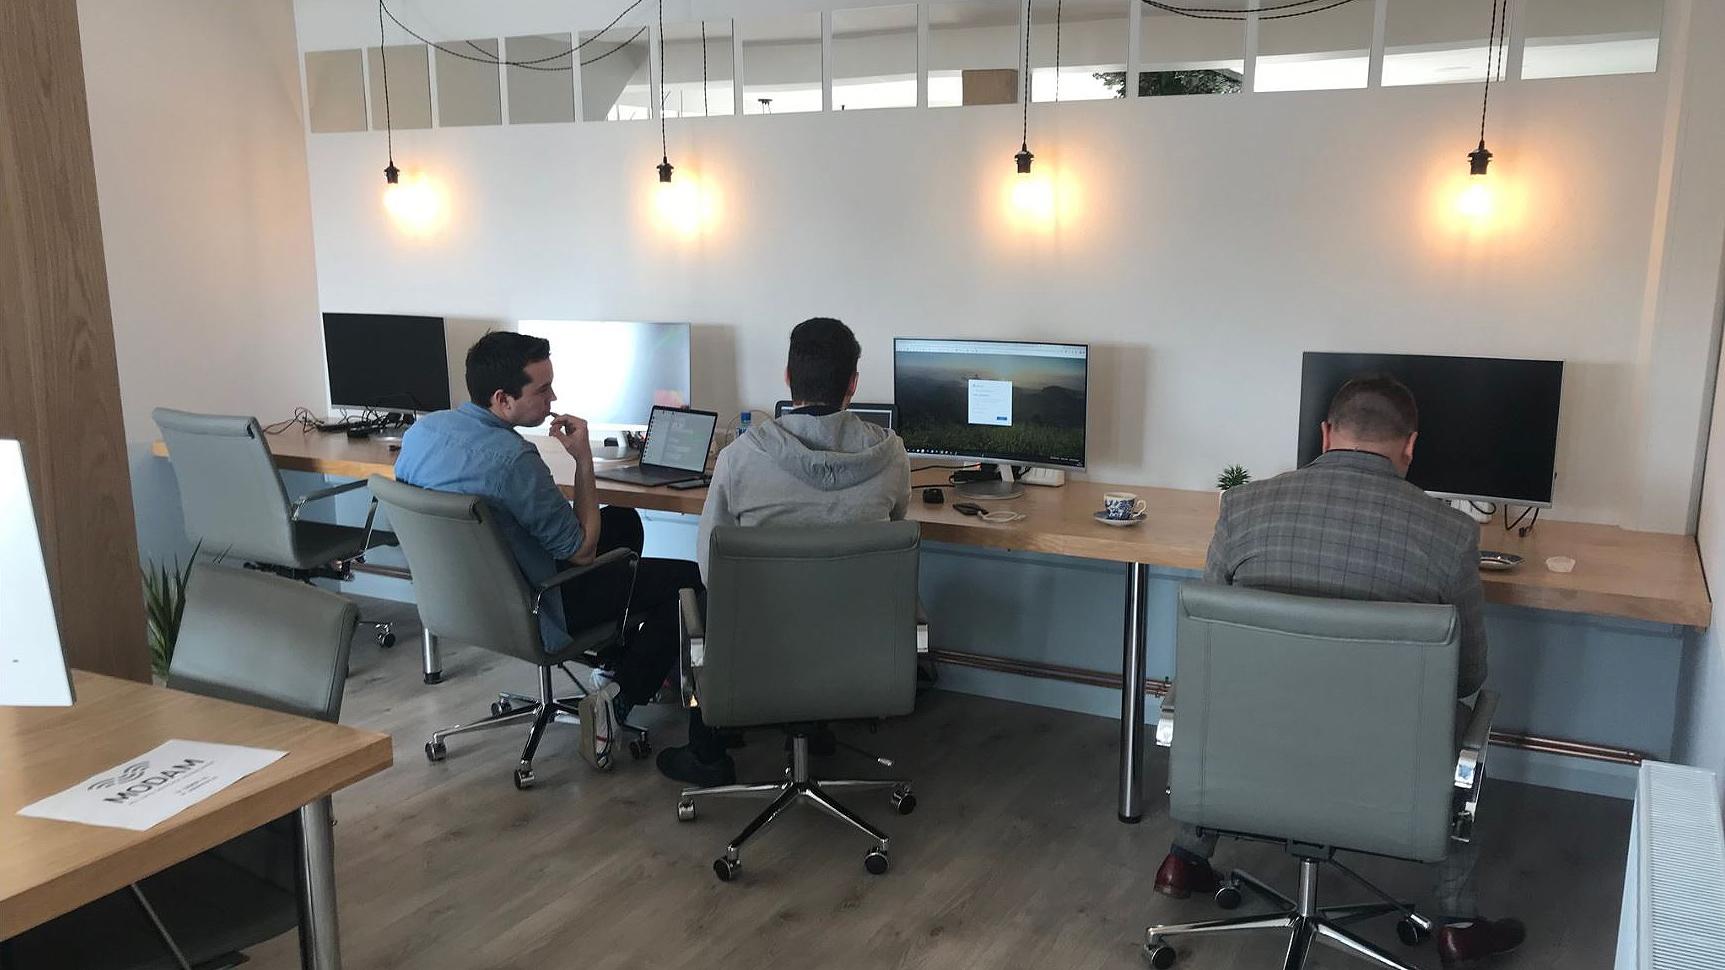 Ireland's first Island Digital Hub connects Arranmore